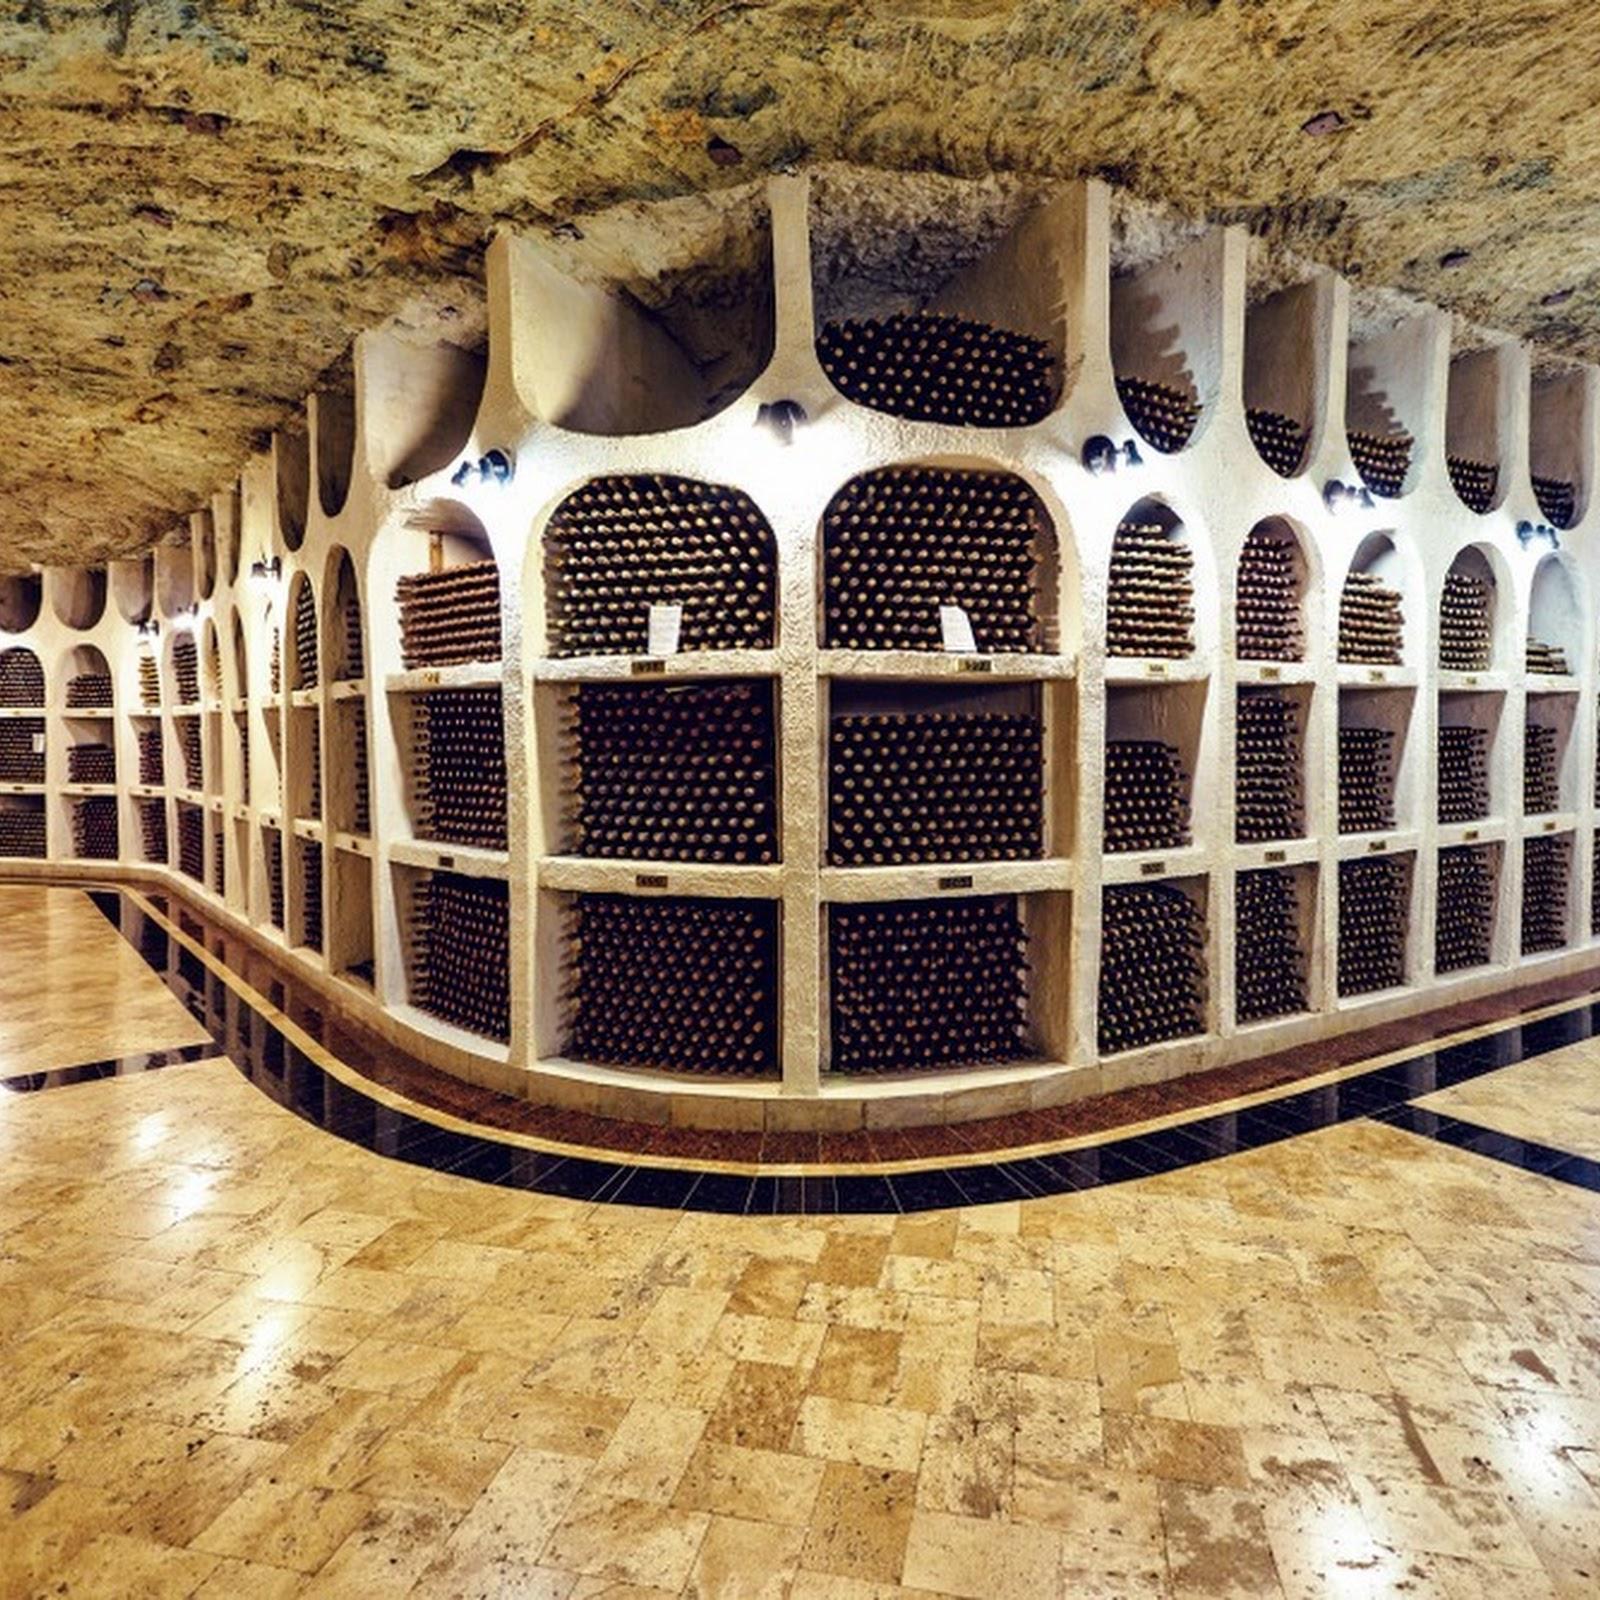 Moldova's Underground Wine City